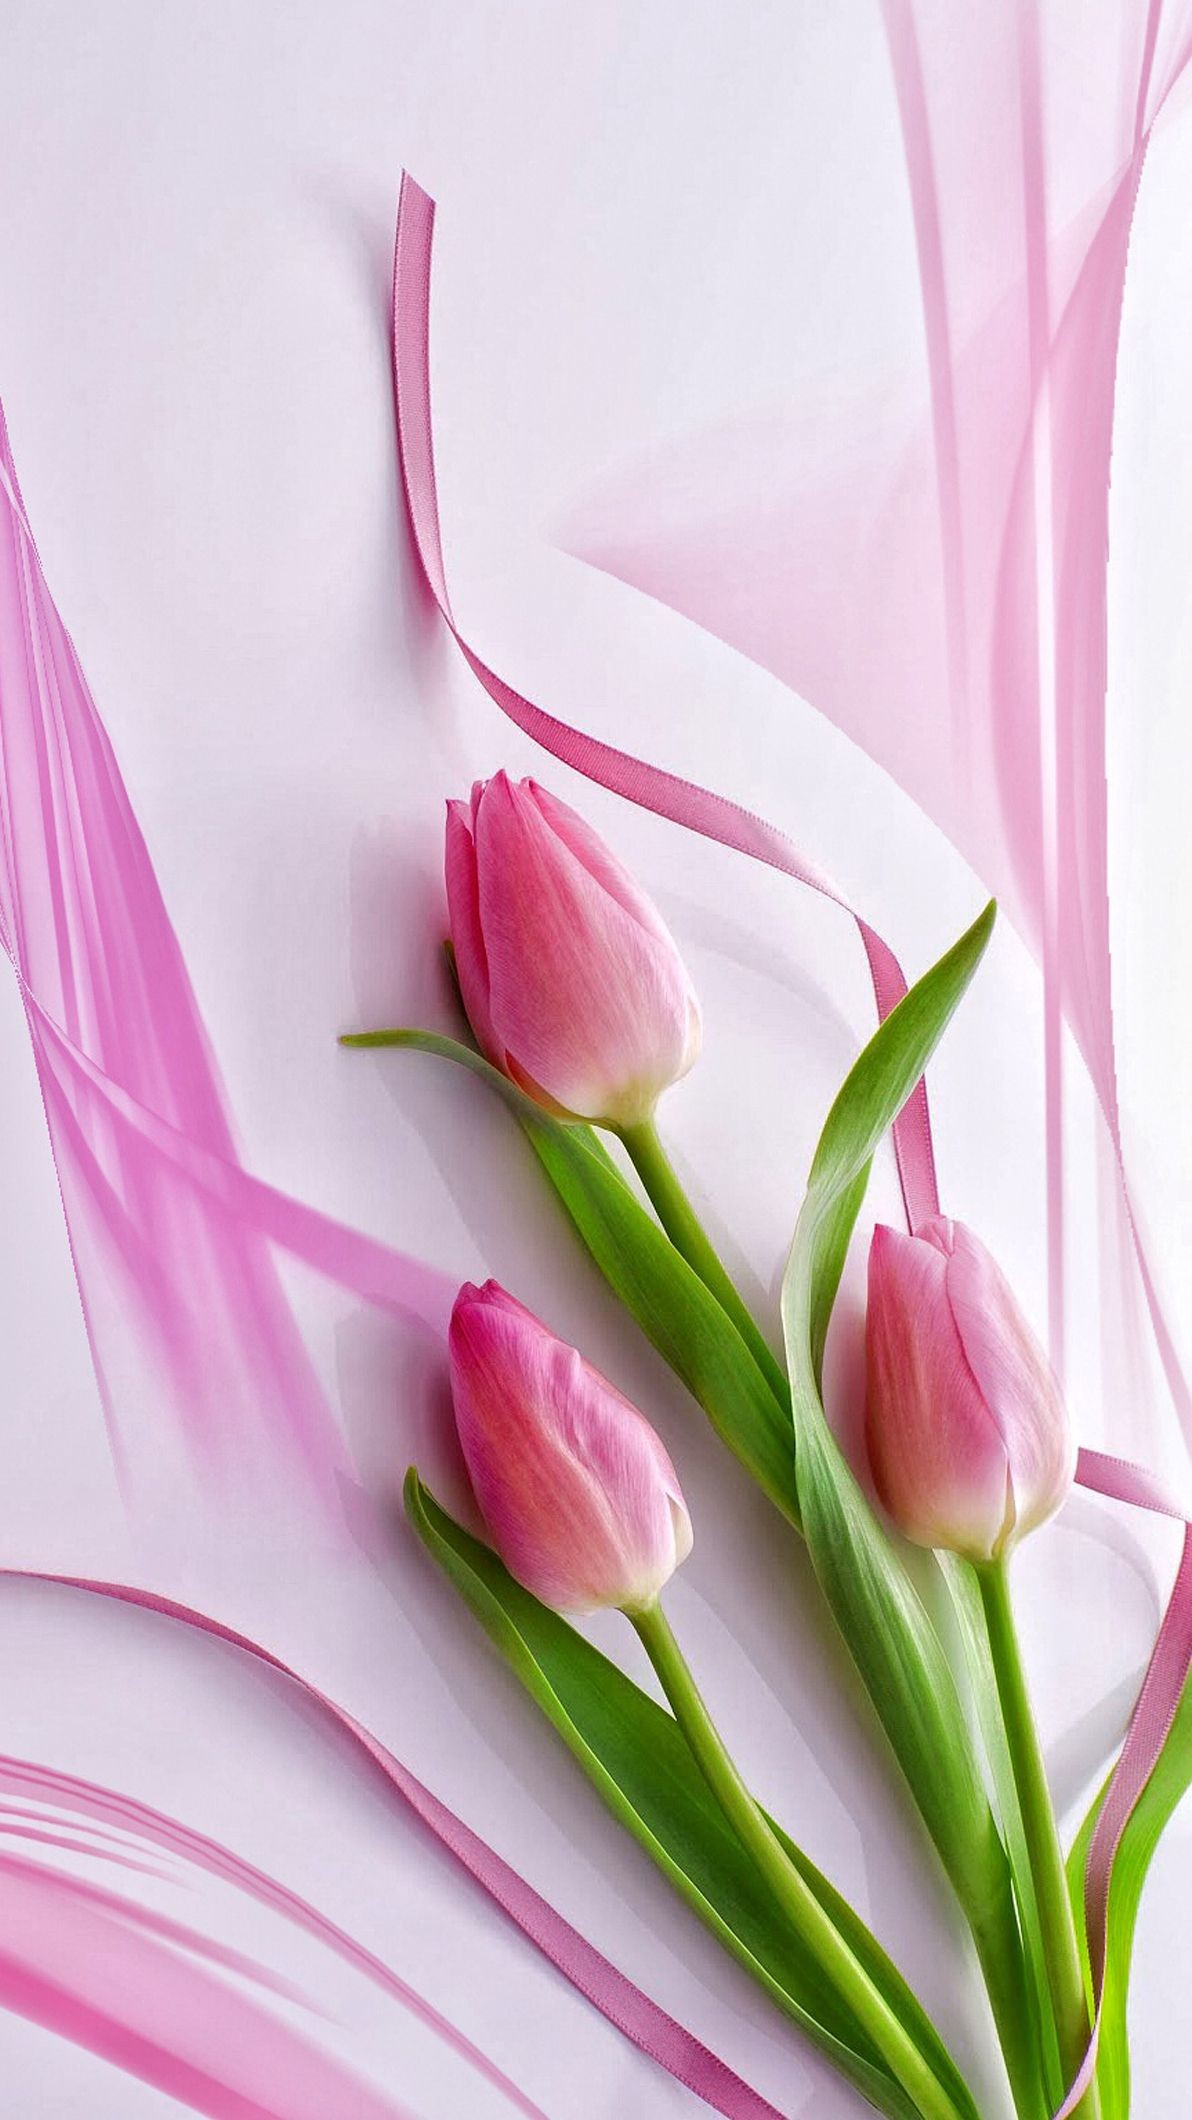 hoa tulip hồng đẹp nhất